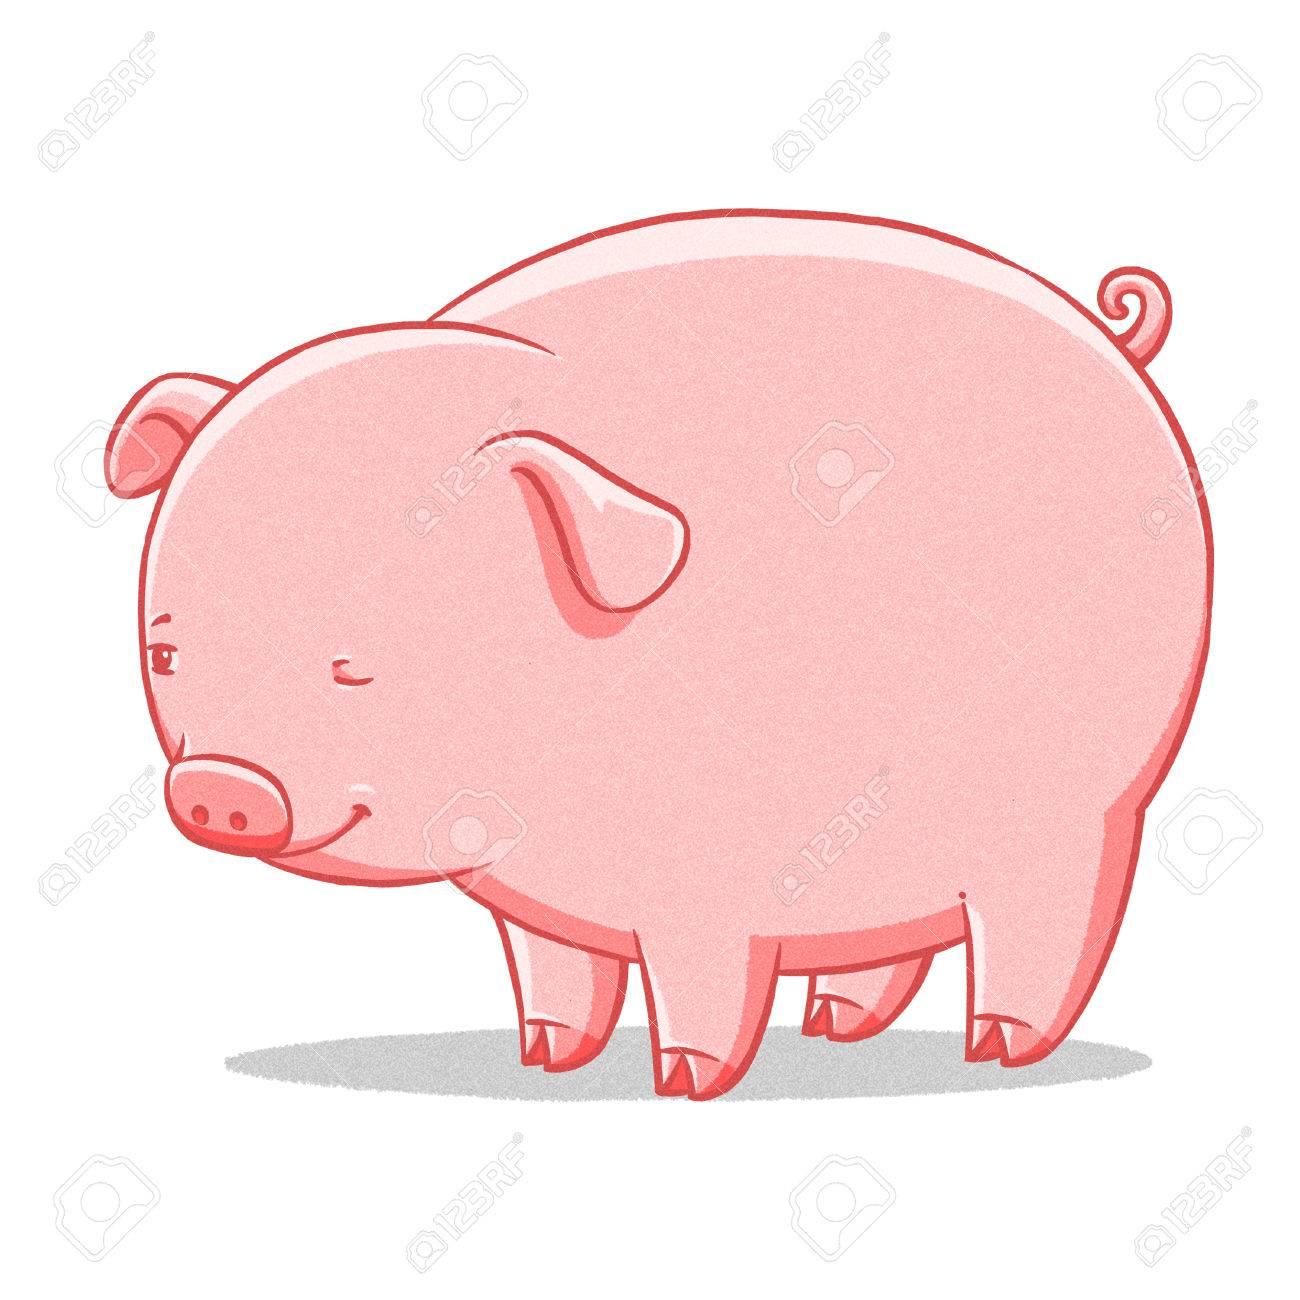 funny cartoon cute cool fat pig illustration stock photo picture rh 123rf com fat pig cartoon pictures fat little pig cartoon